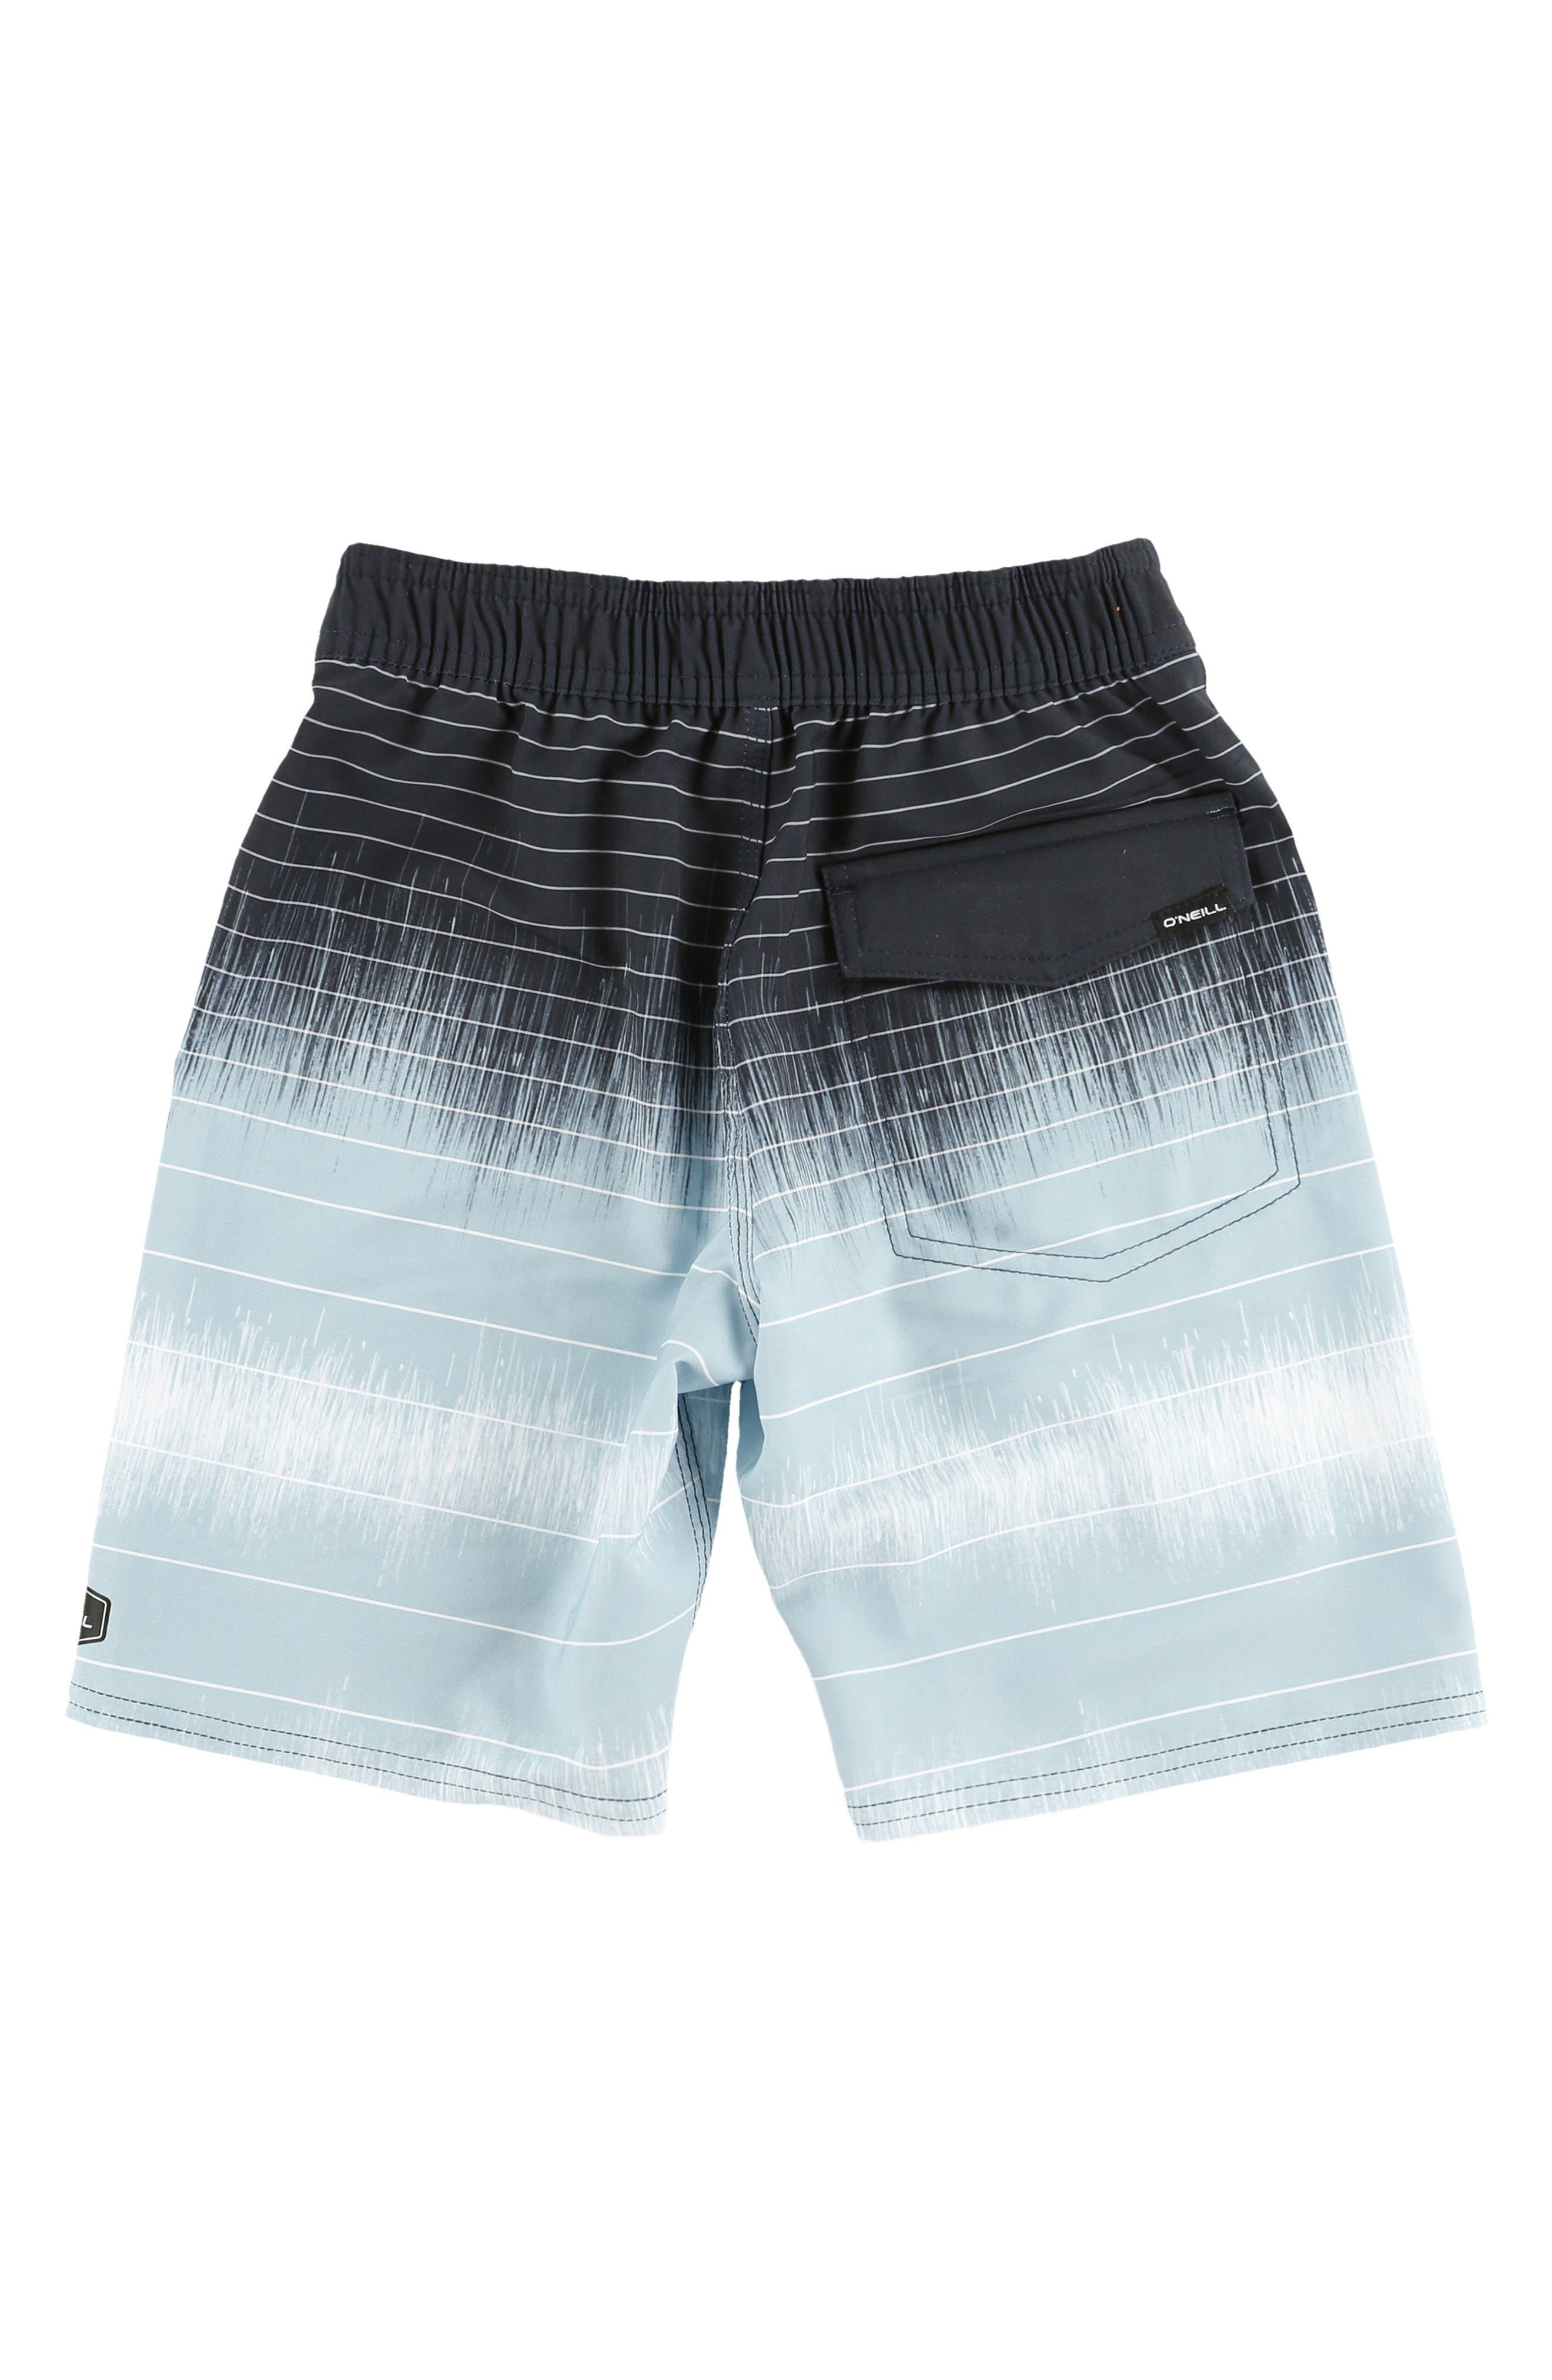 Hyperfreak Seismic Board Shorts,                             Alternate thumbnail 2, color,                             400